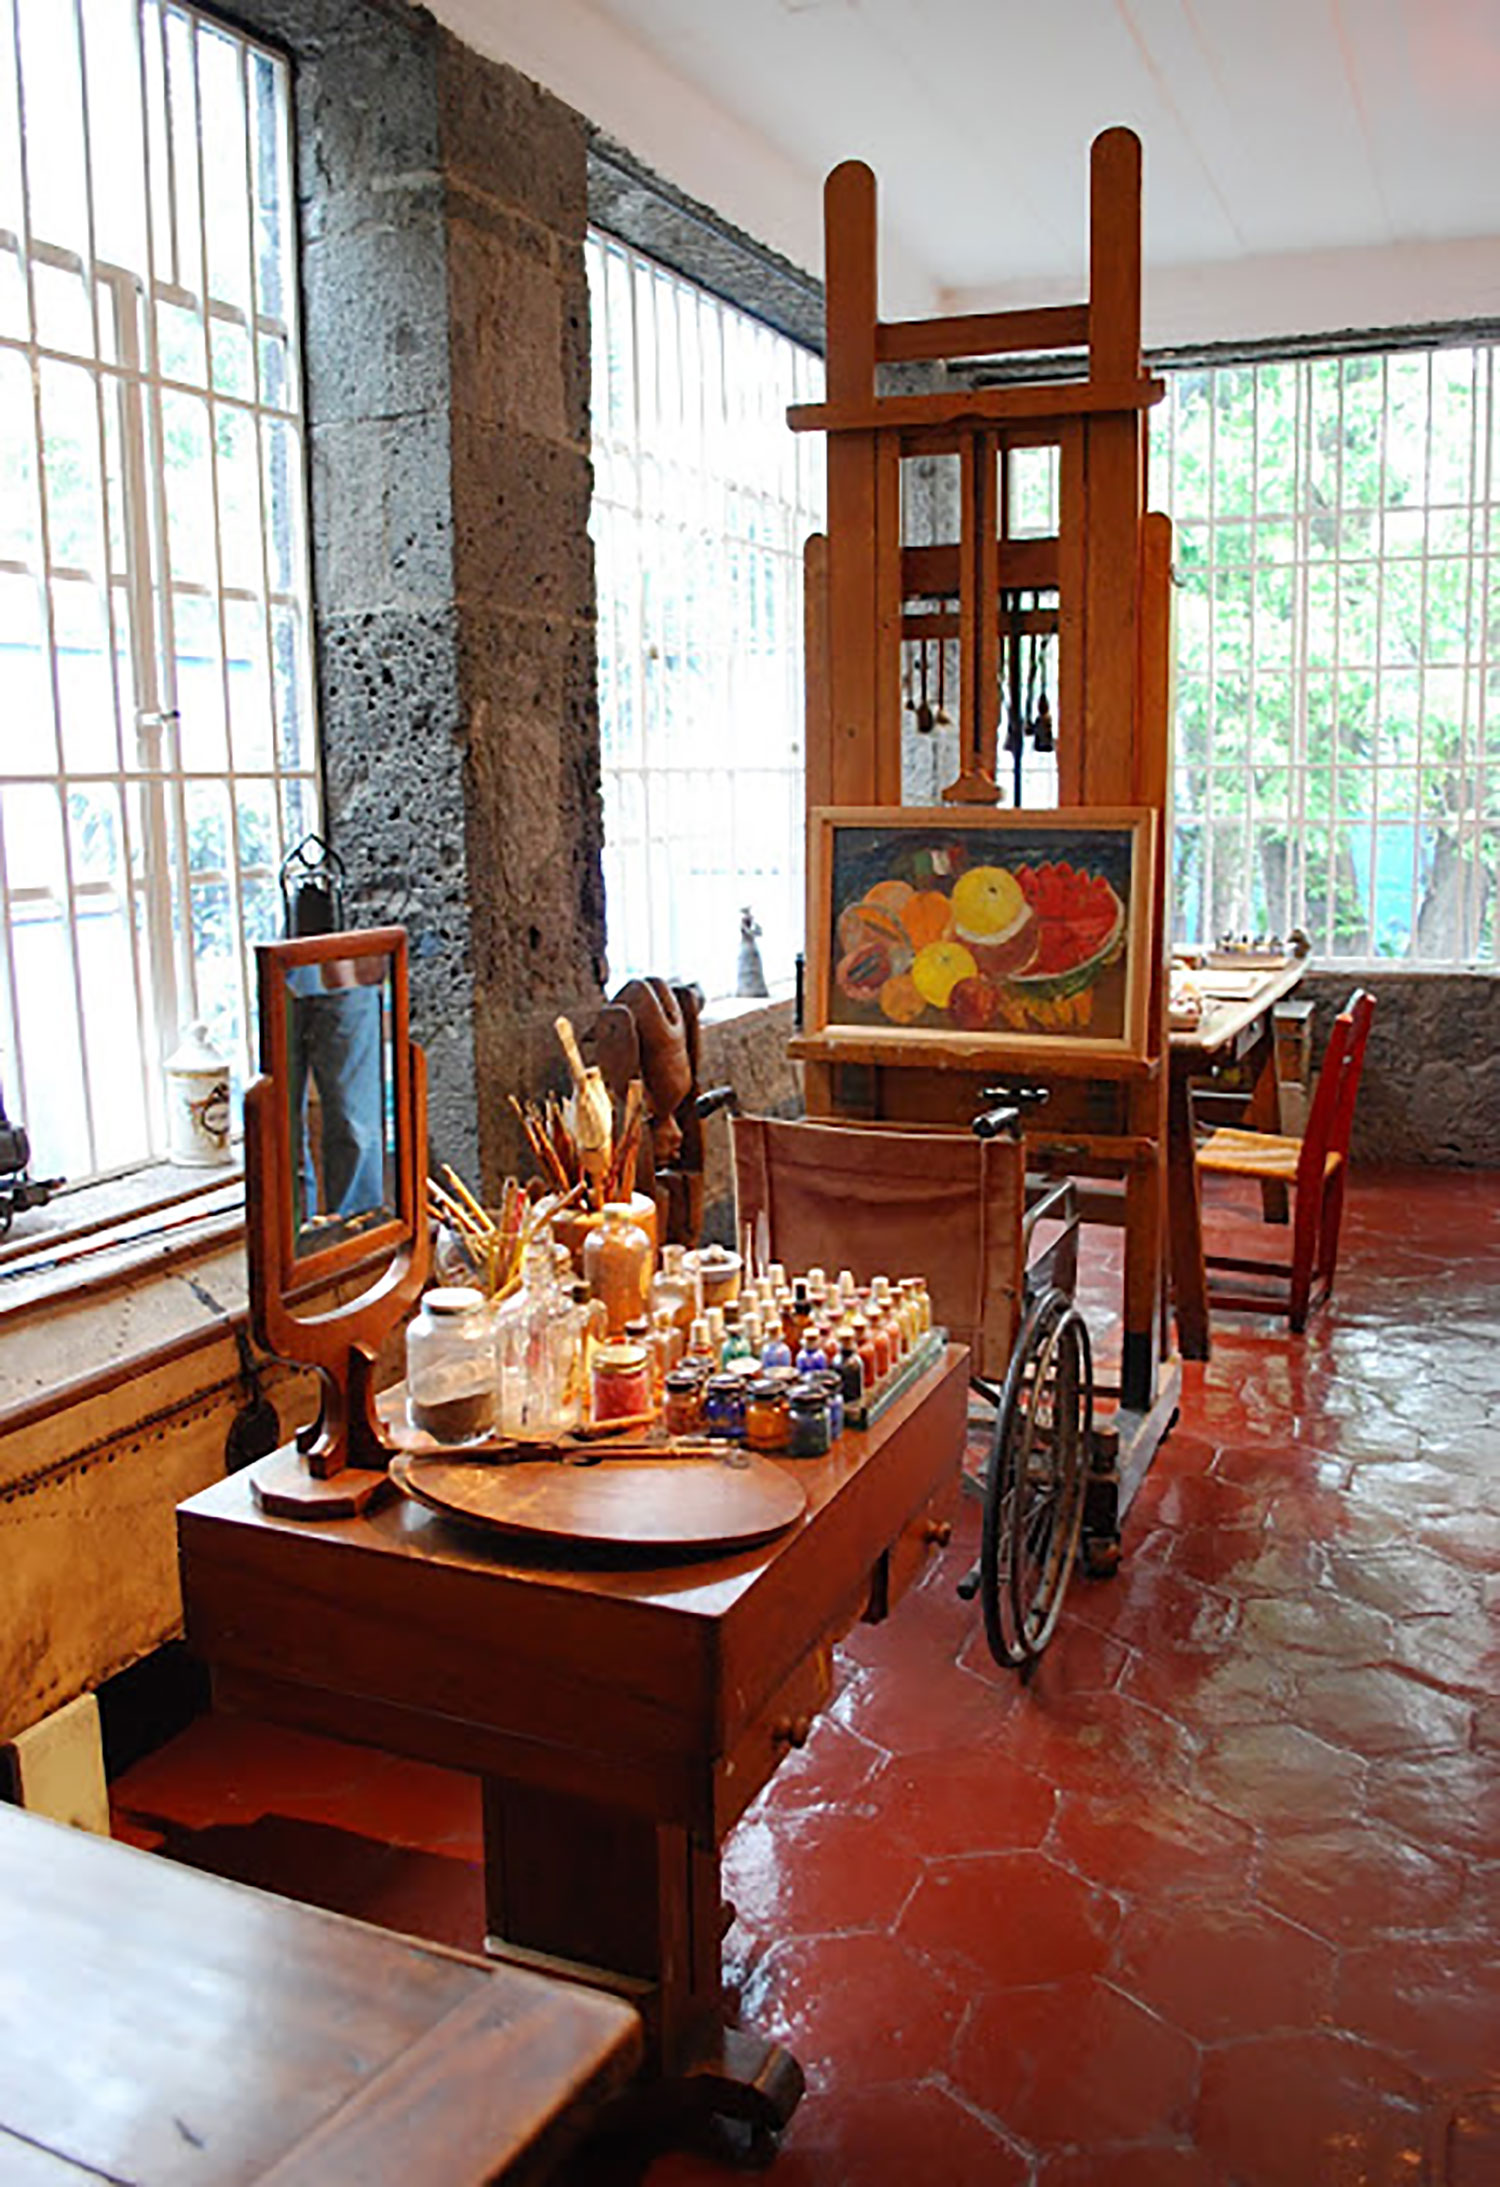 Frida's studio with her wheelchair.